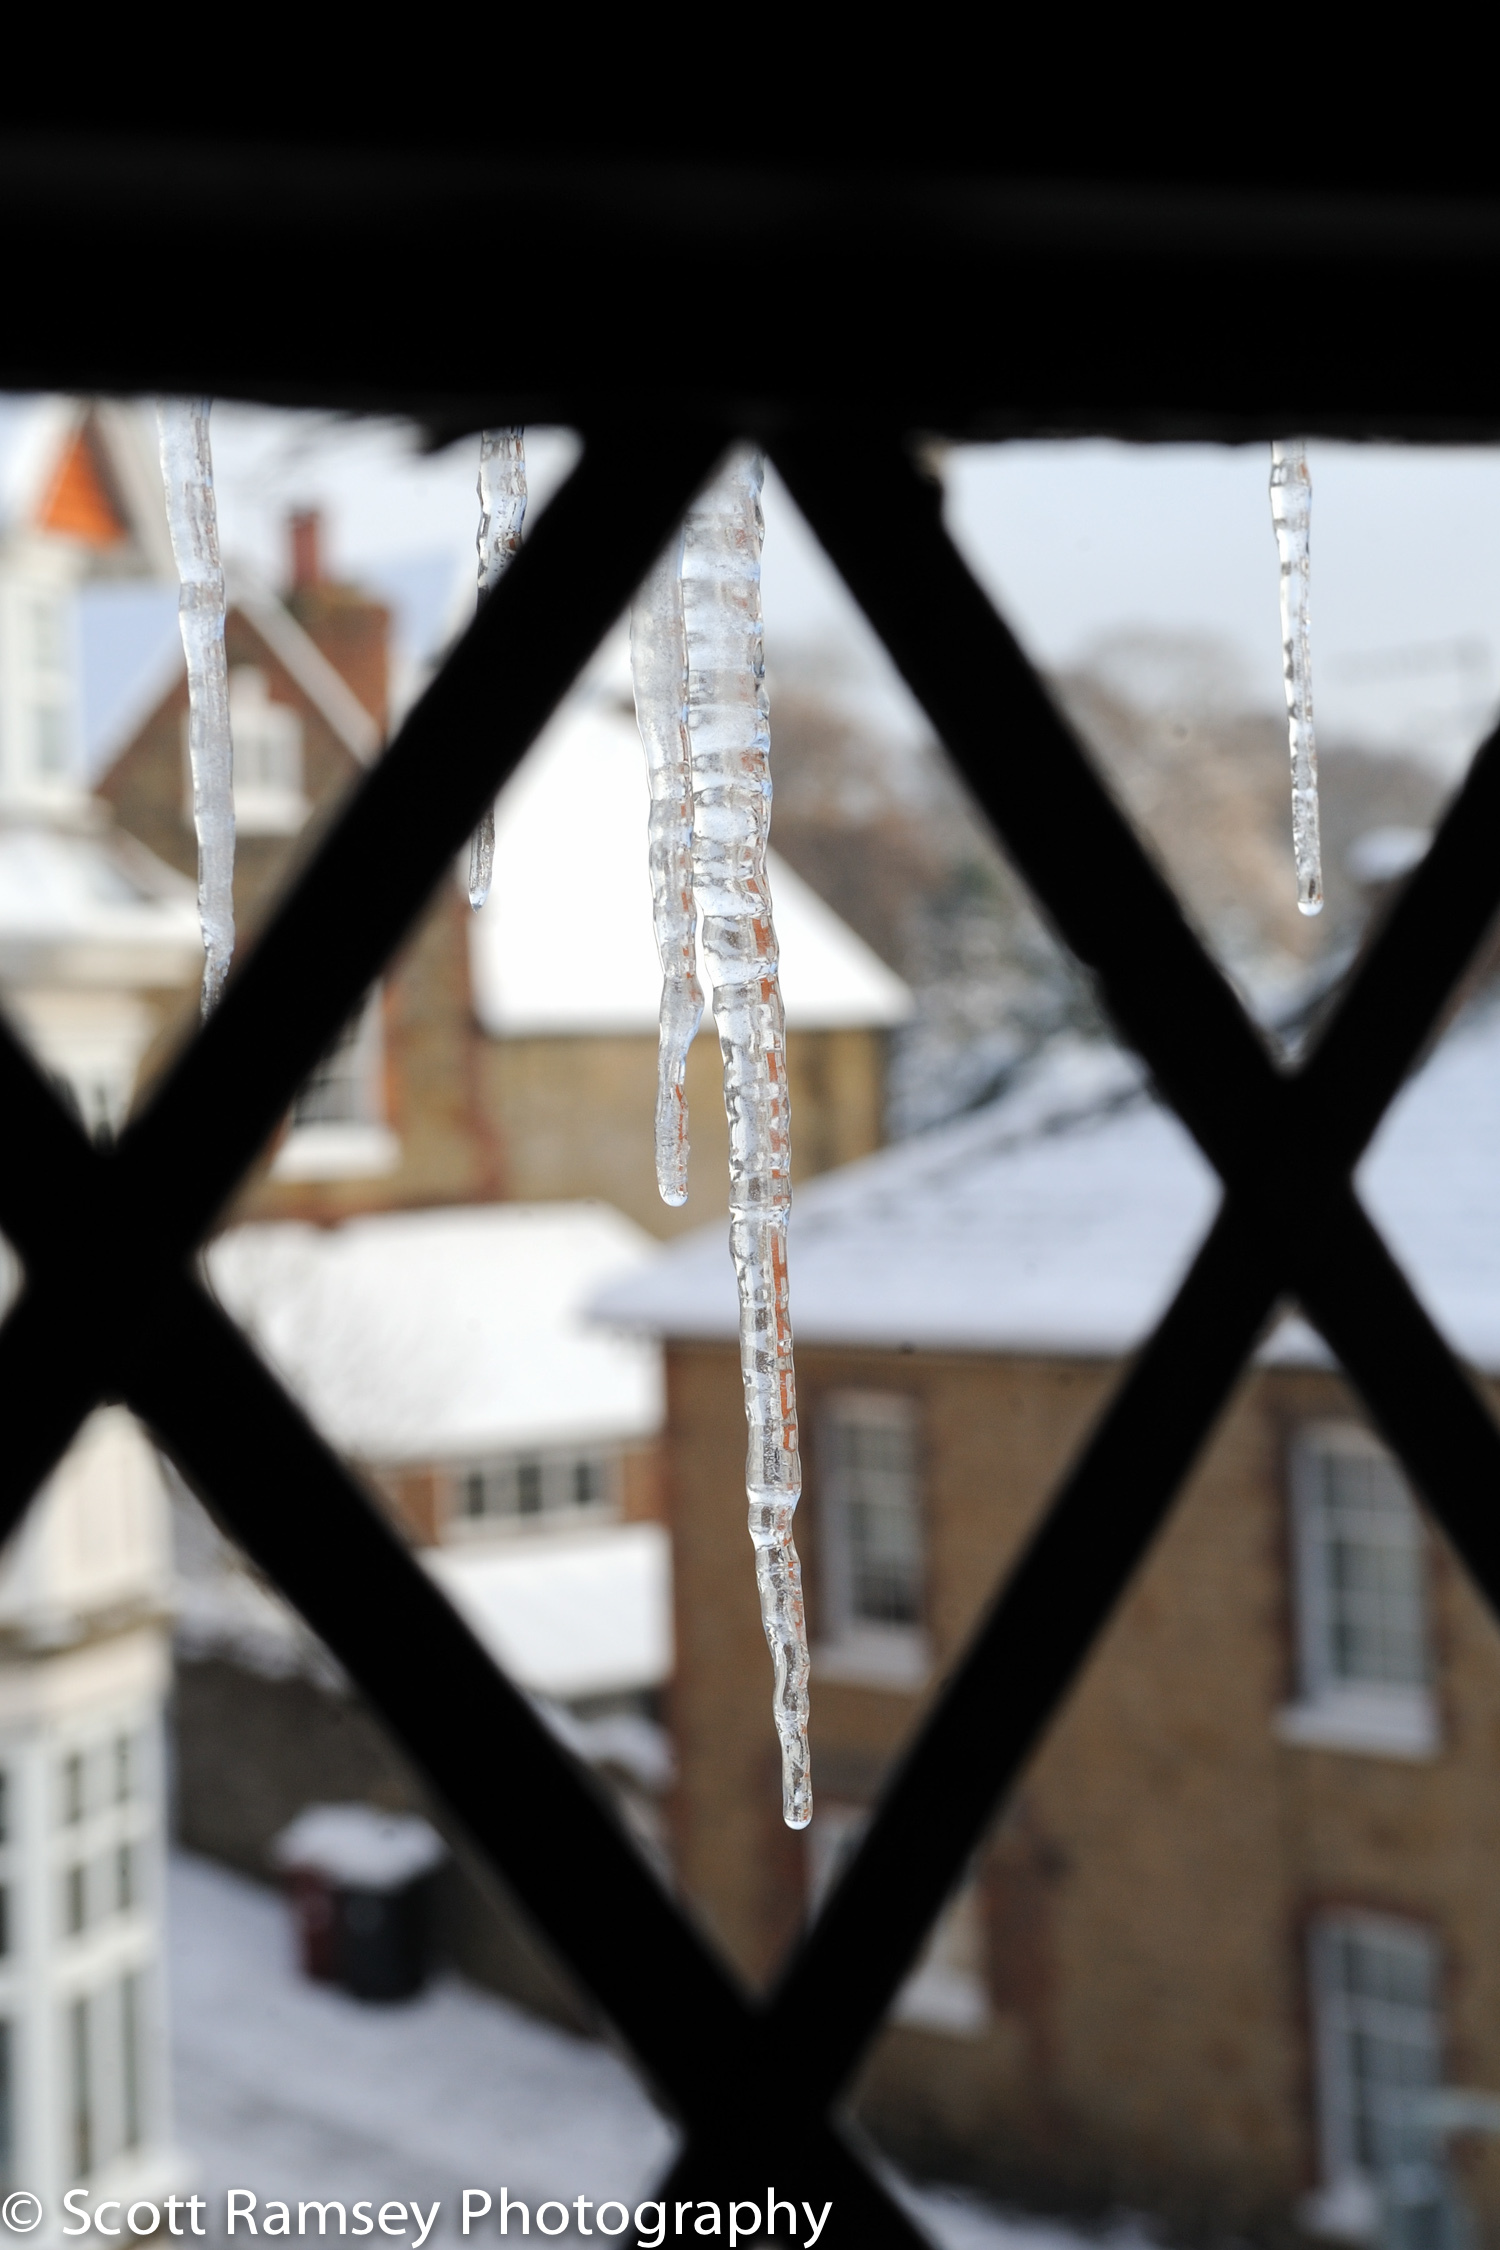 Winter-Wedding-Spread-Eagle-Hotel-Midhurst-icicles-031210-0062